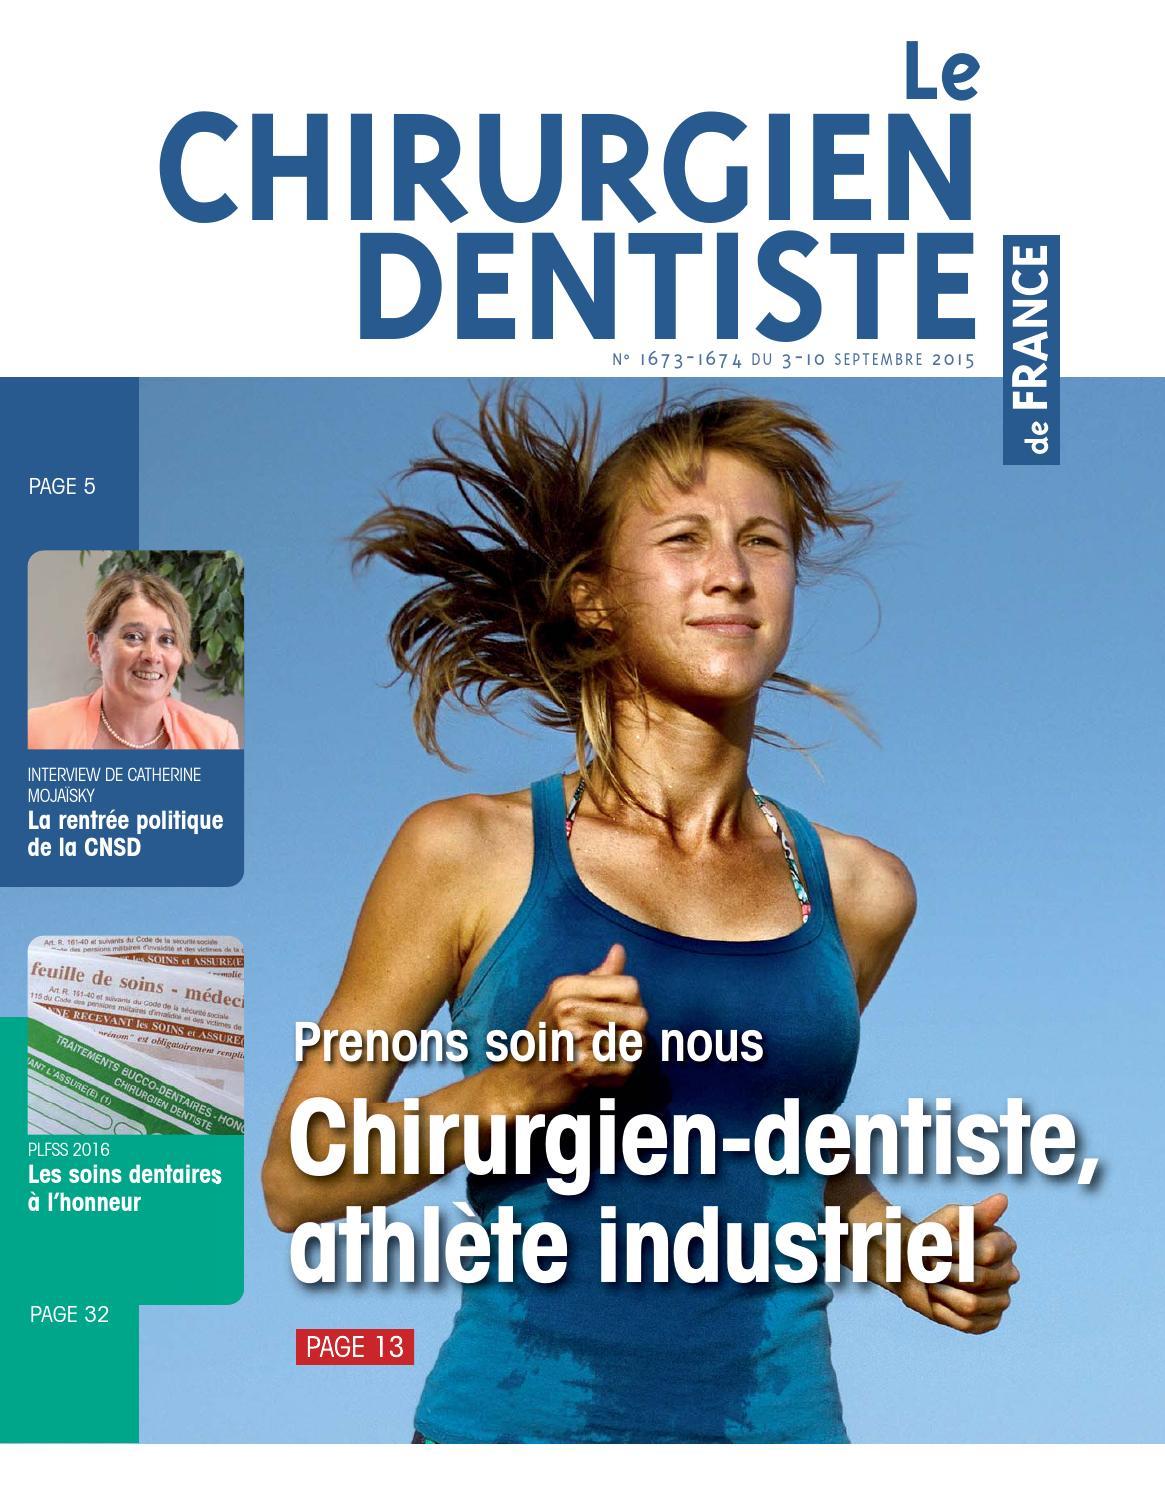 CHIRURGIEN DENTISTE DE FRANCE